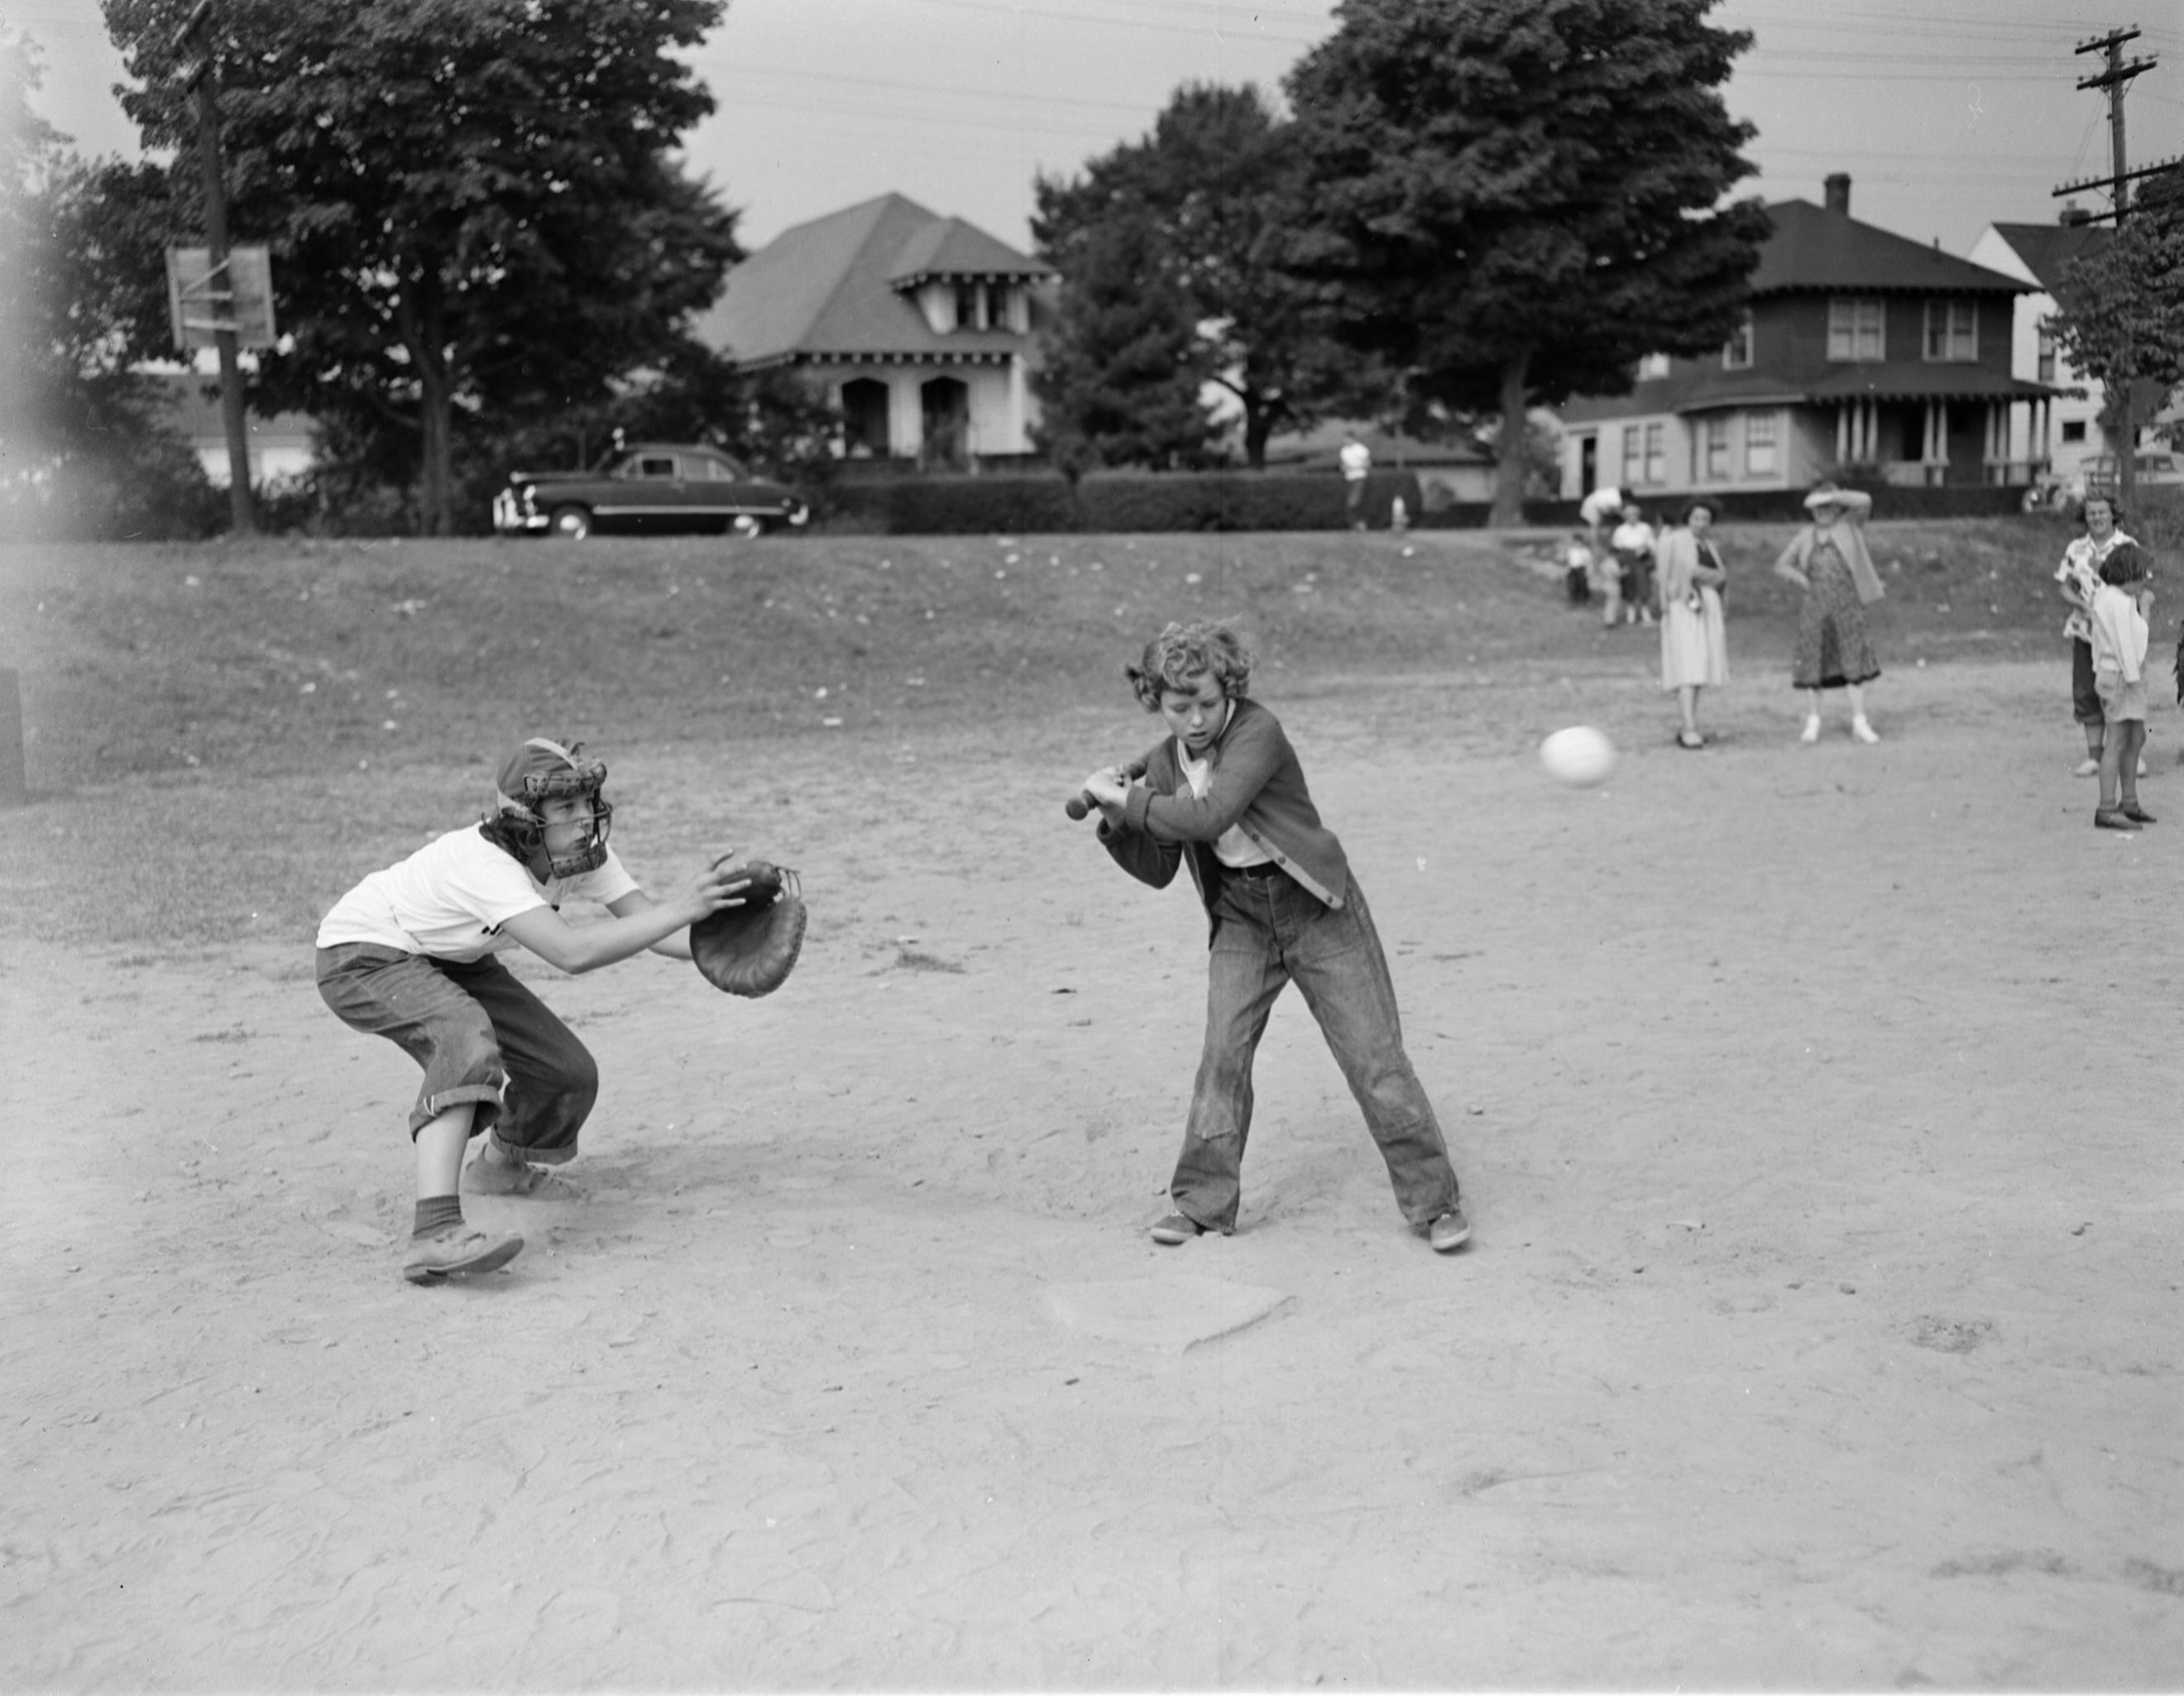 Youth Baseball Game (April 17 1949) GC145 2